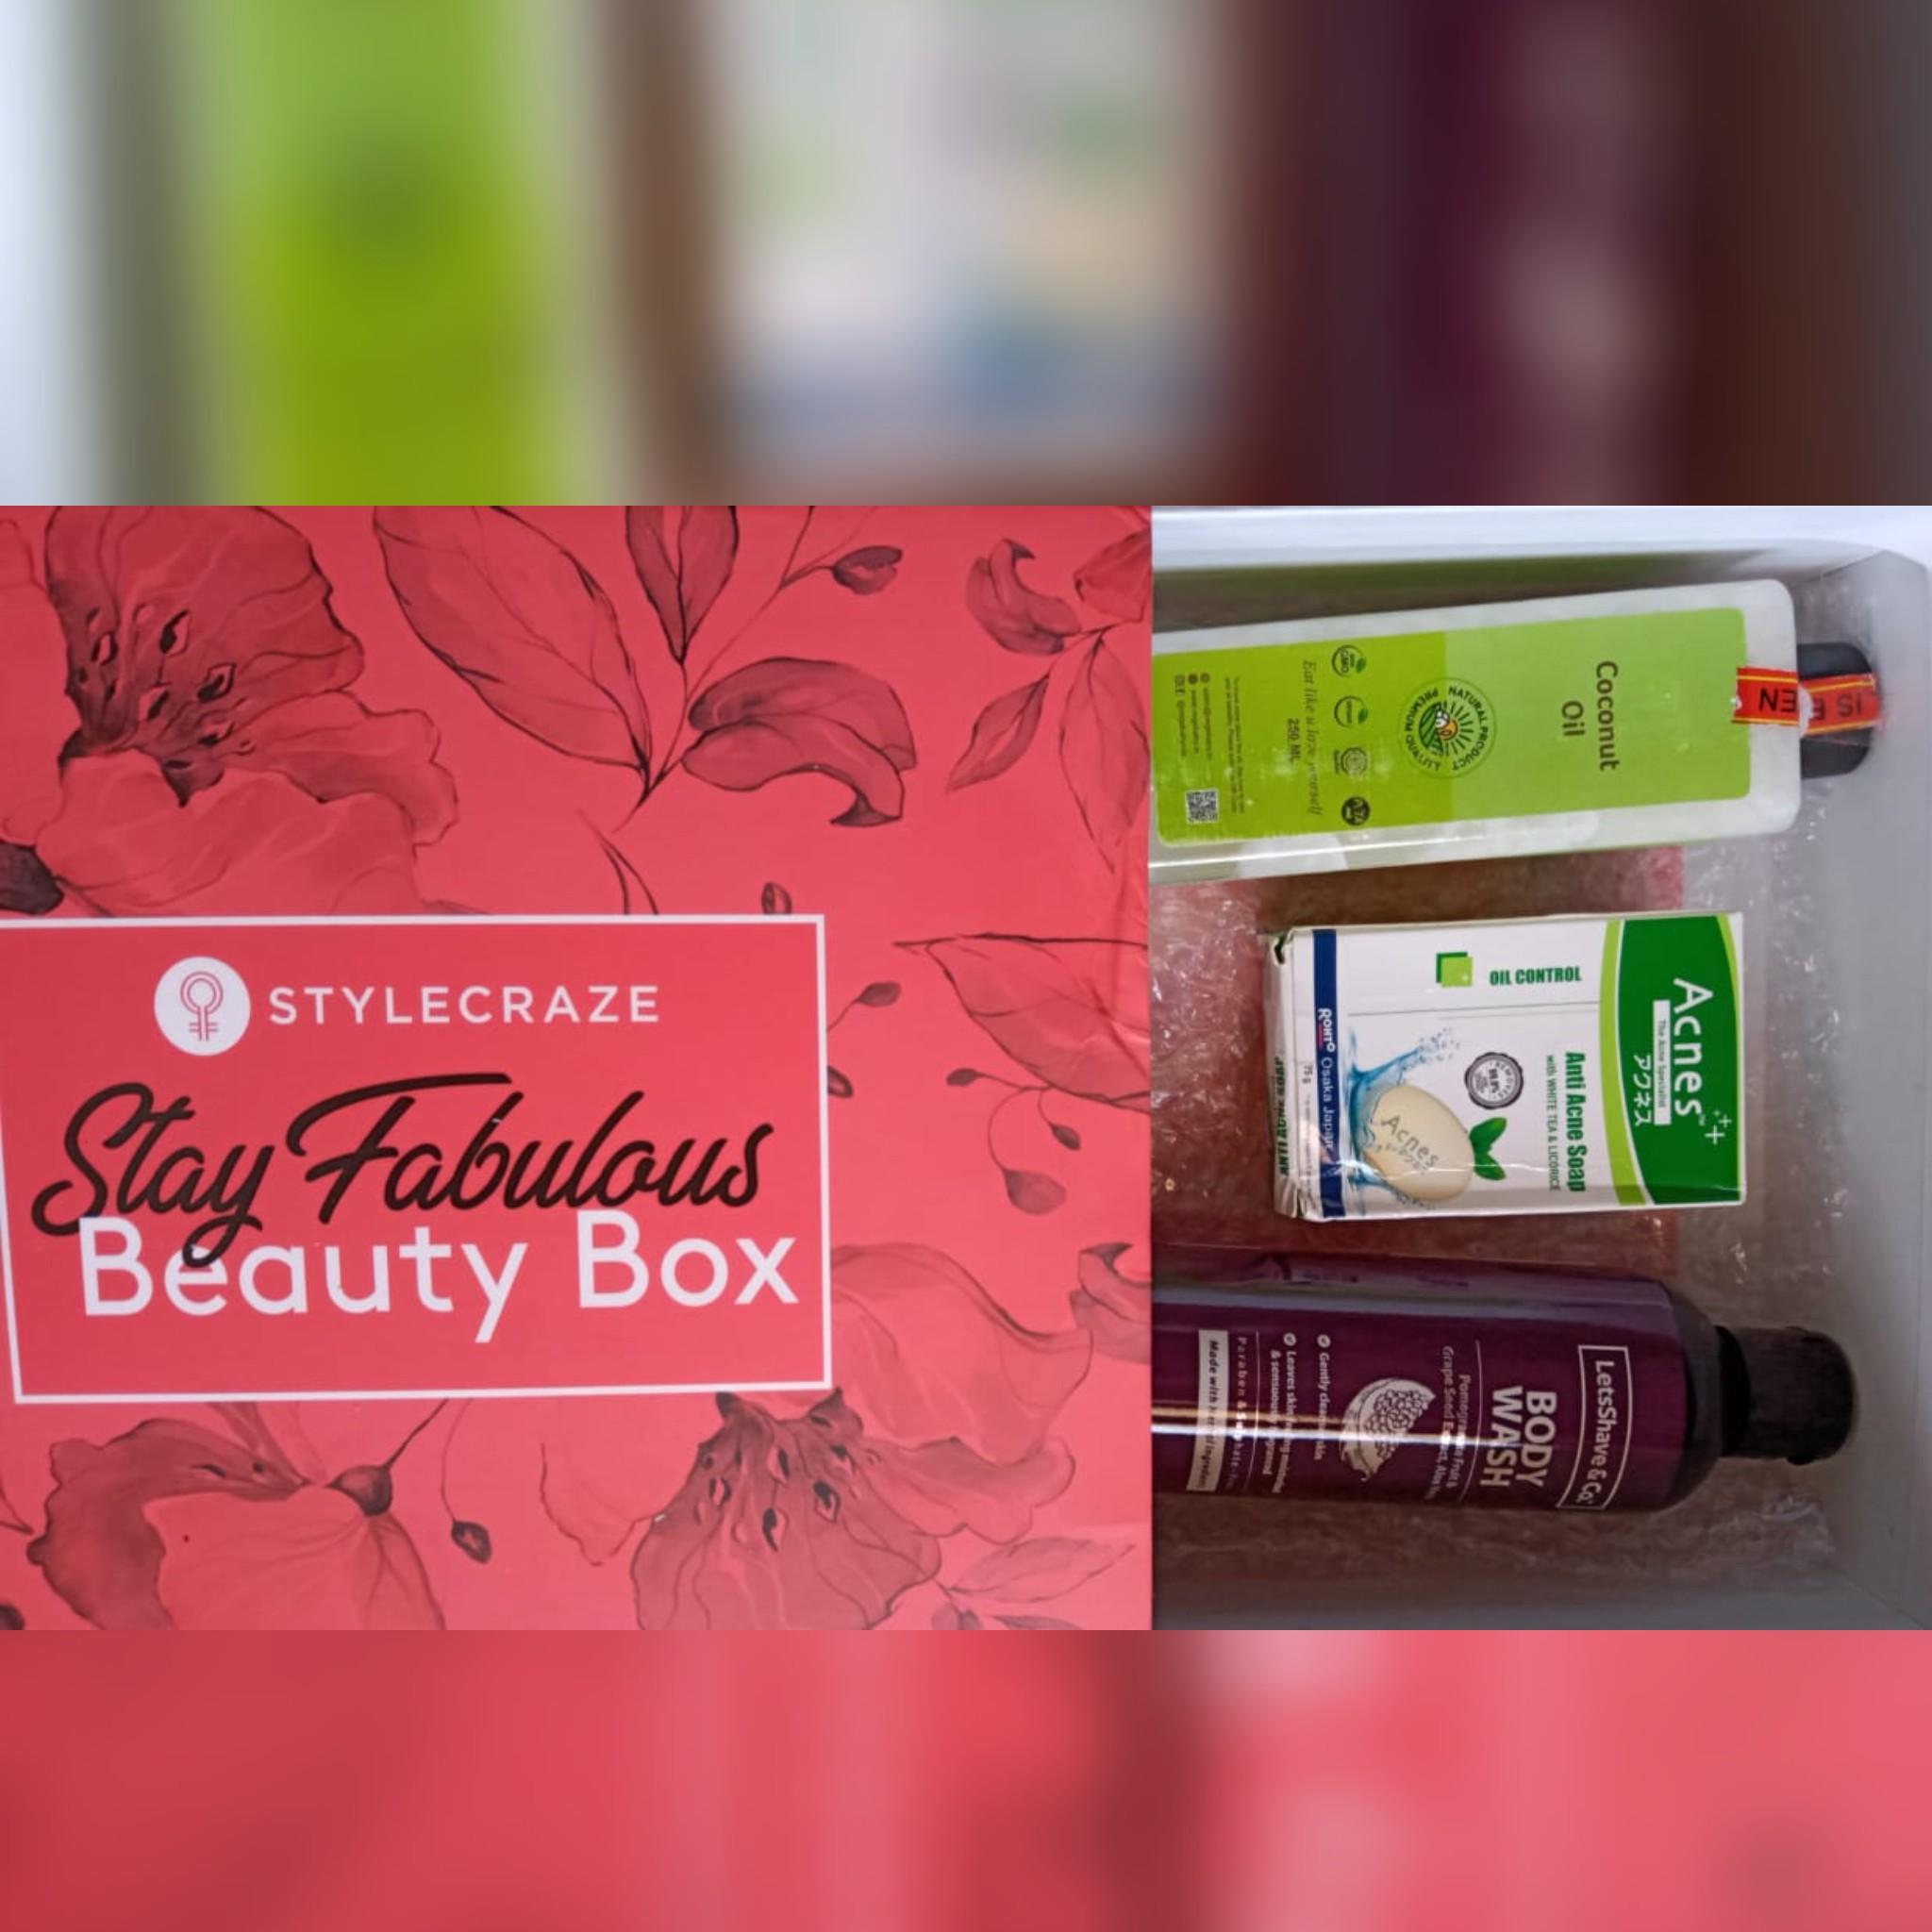 Acnes Oil Control Soap -Best & safe choice for sensitive skin-By tulipragi